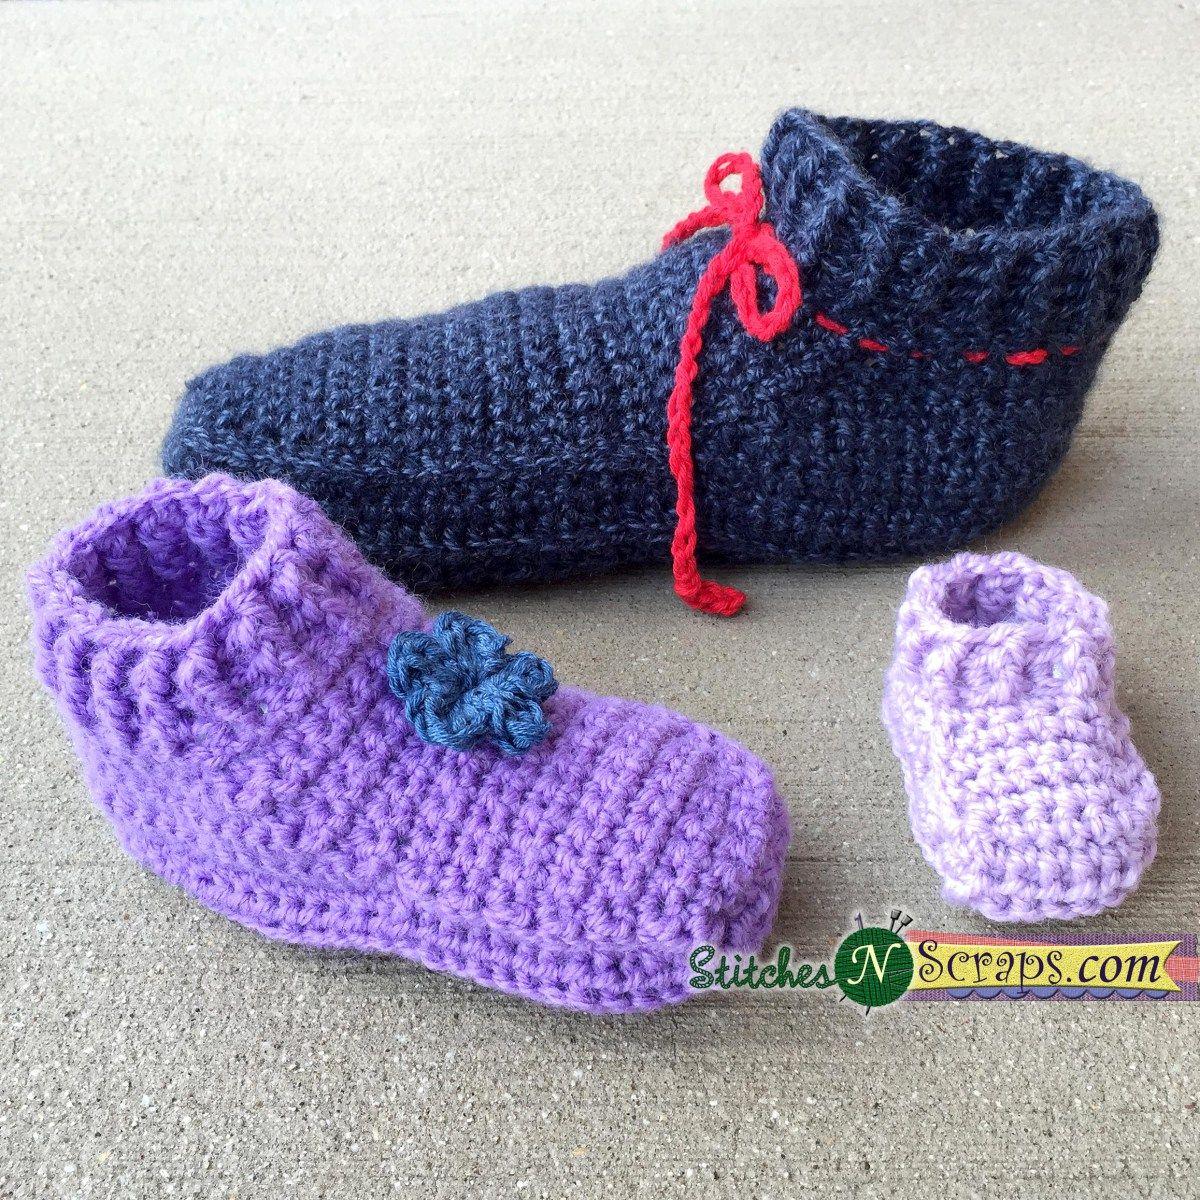 Free Pattern - Non-stop slippers- Adult sizes | crochet | Pinterest ...